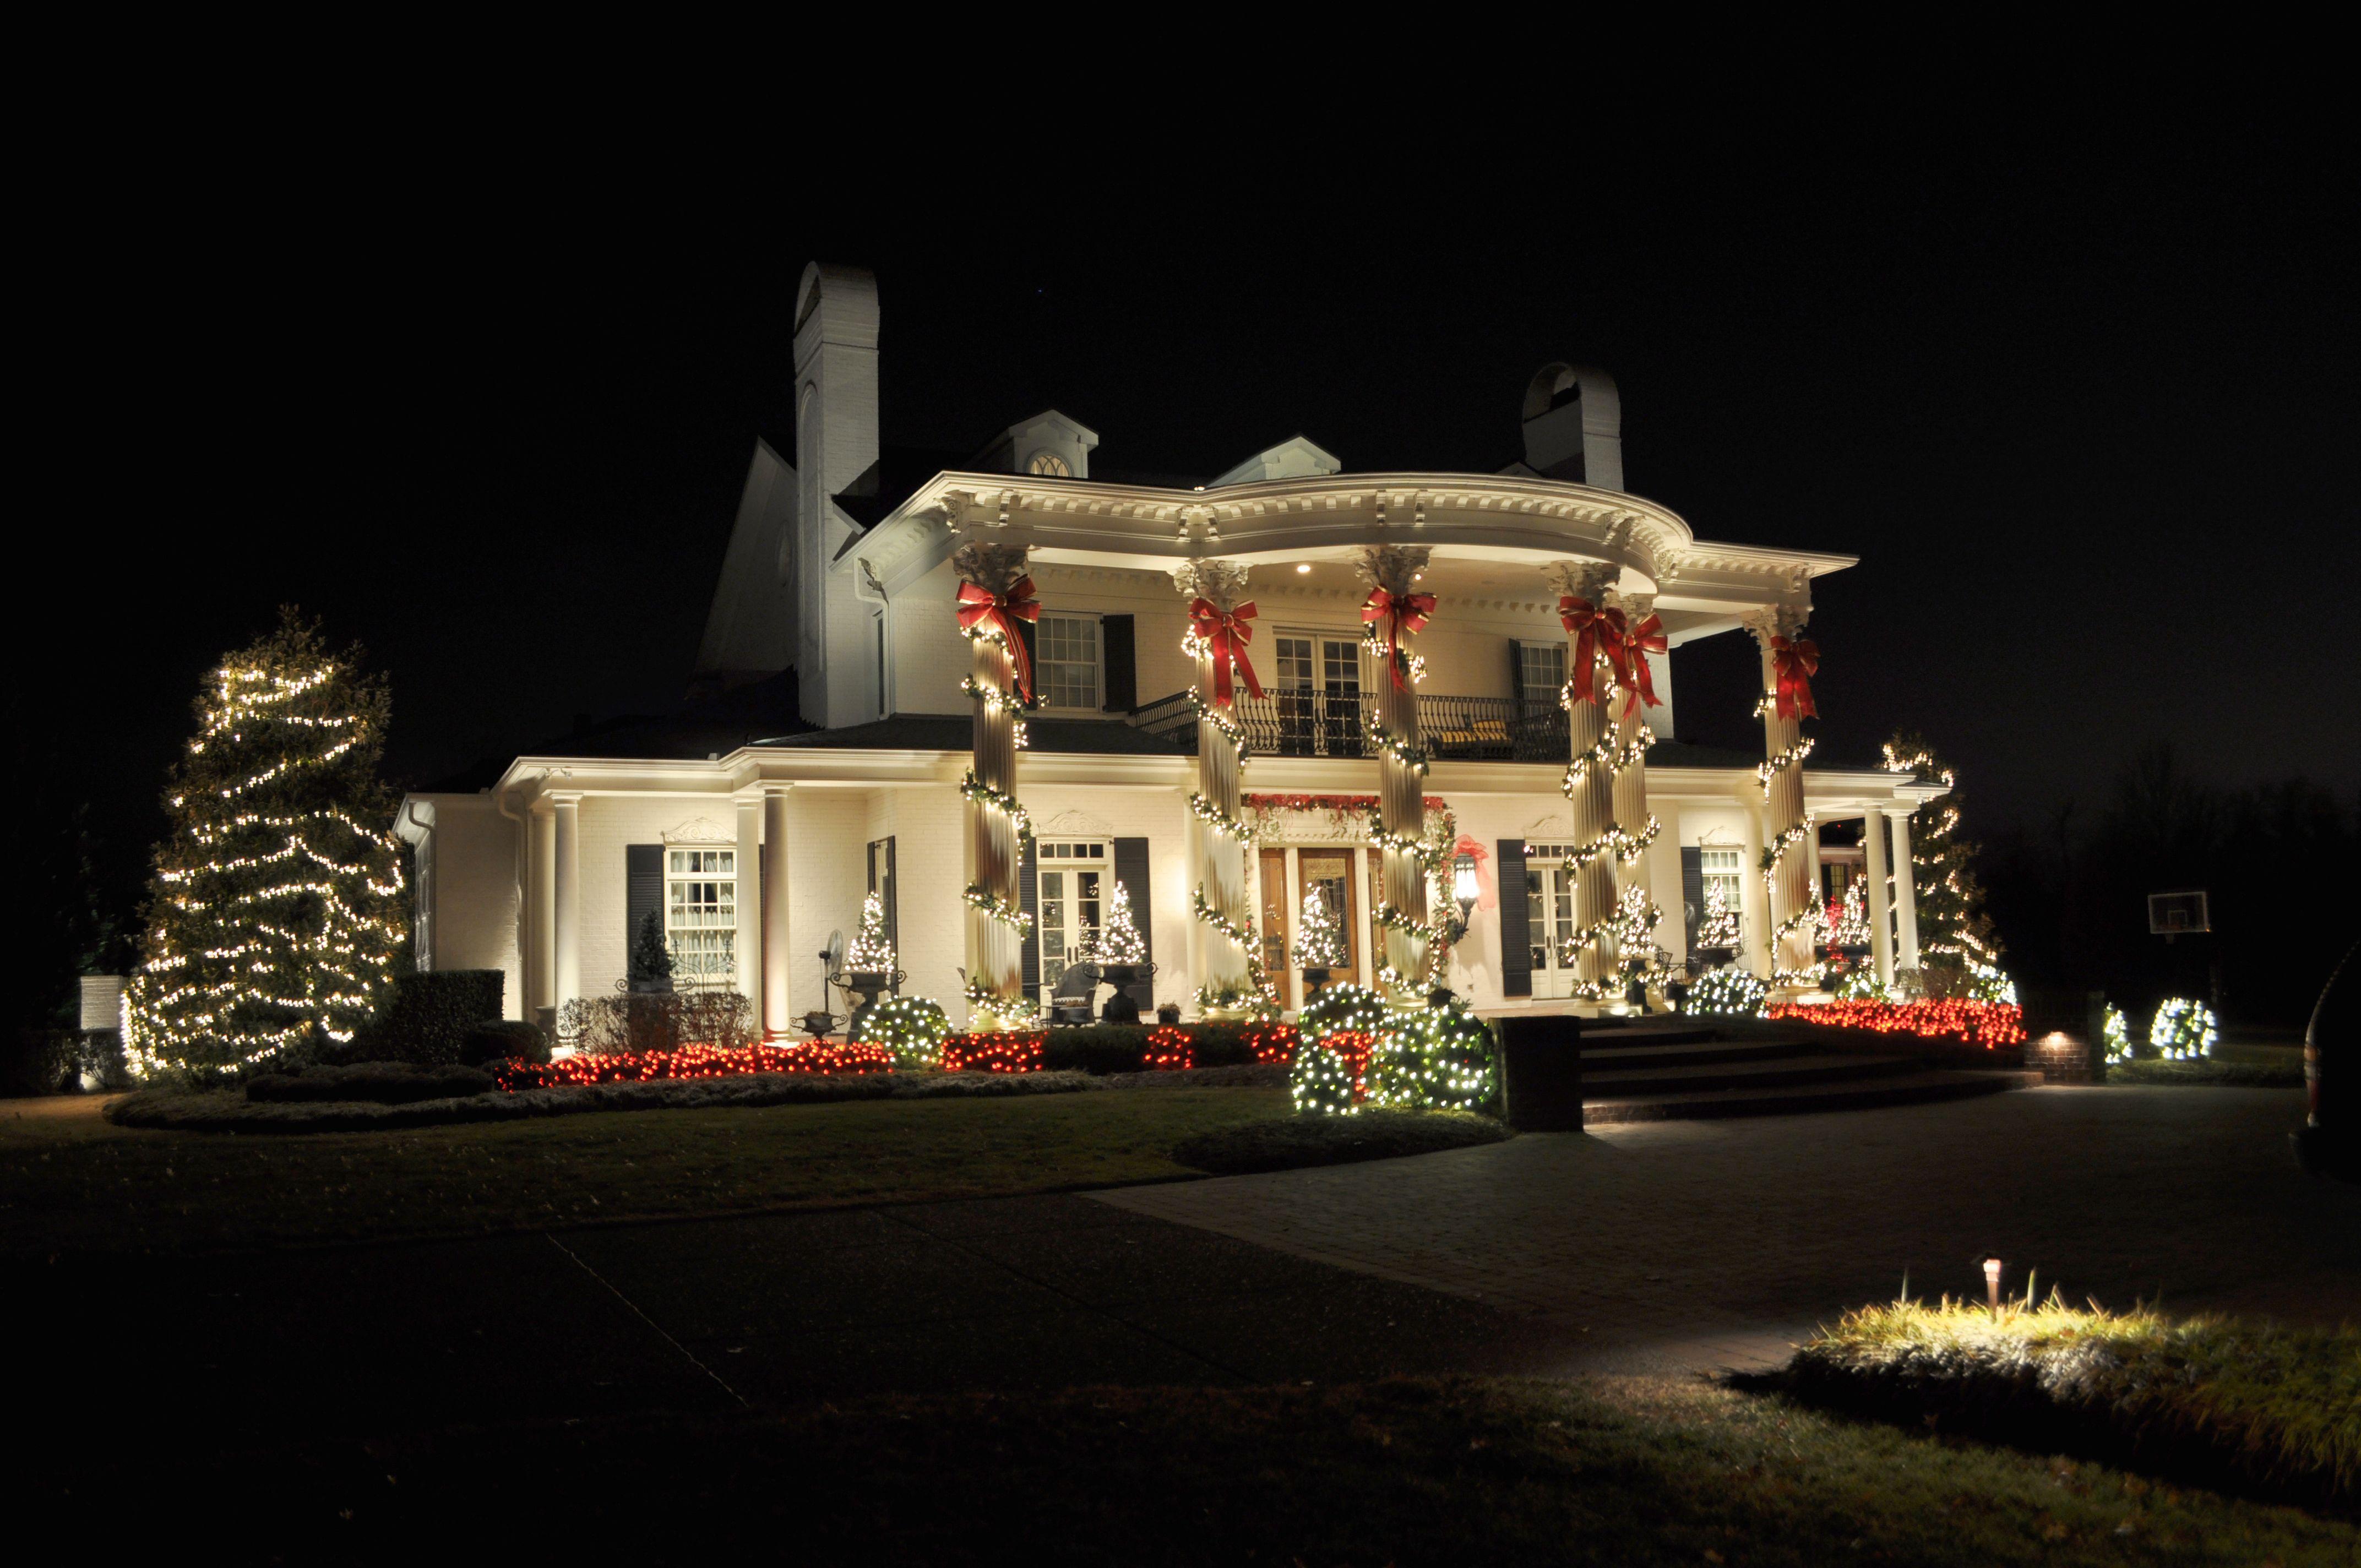 Creative 10 Ideas for Residential Lighting | Christmas lights ...